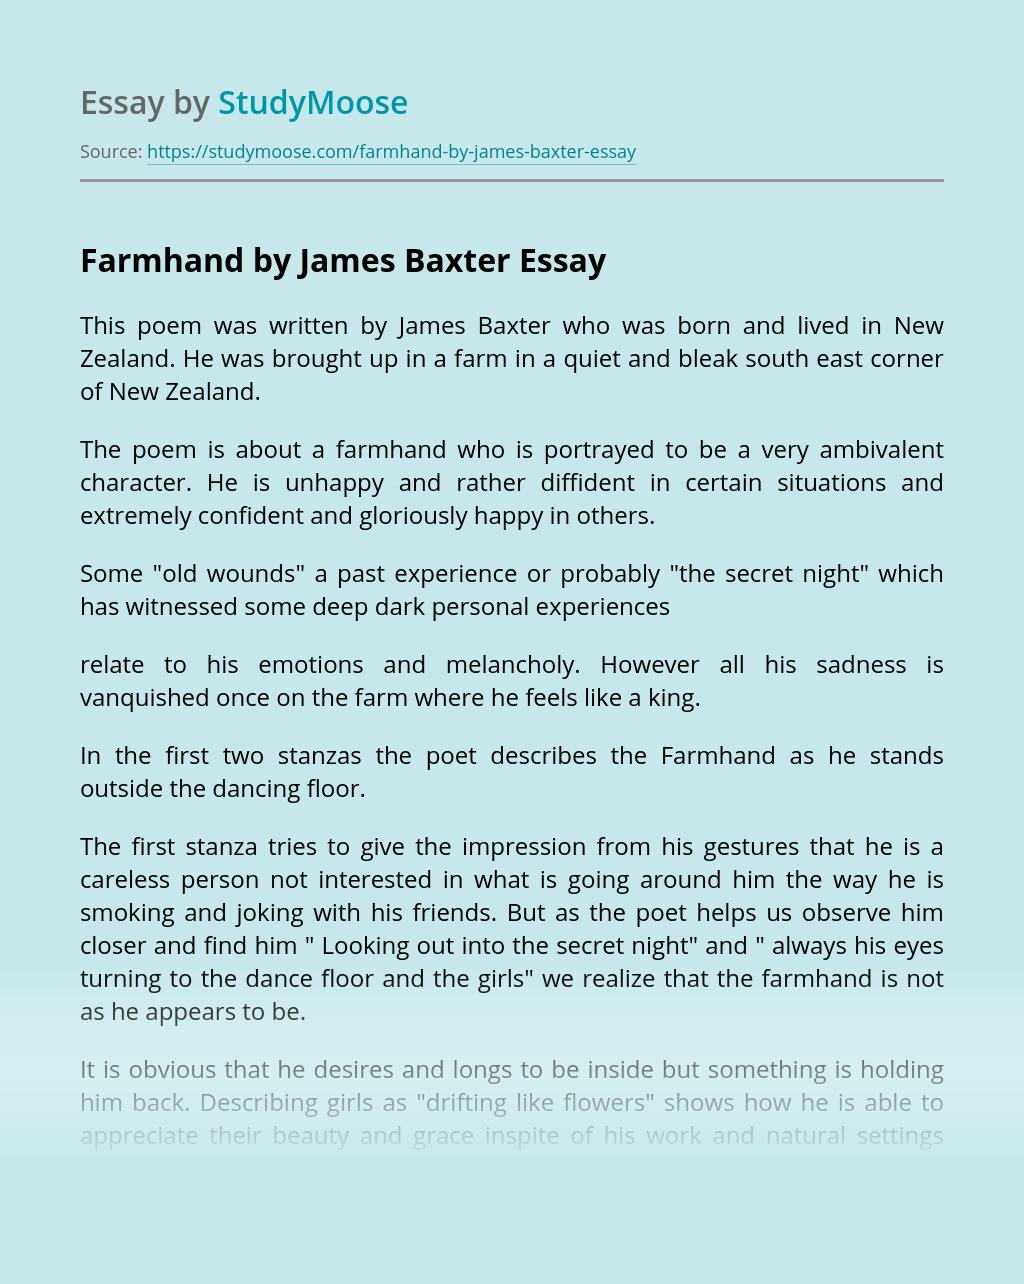 Farmhand by James Baxter